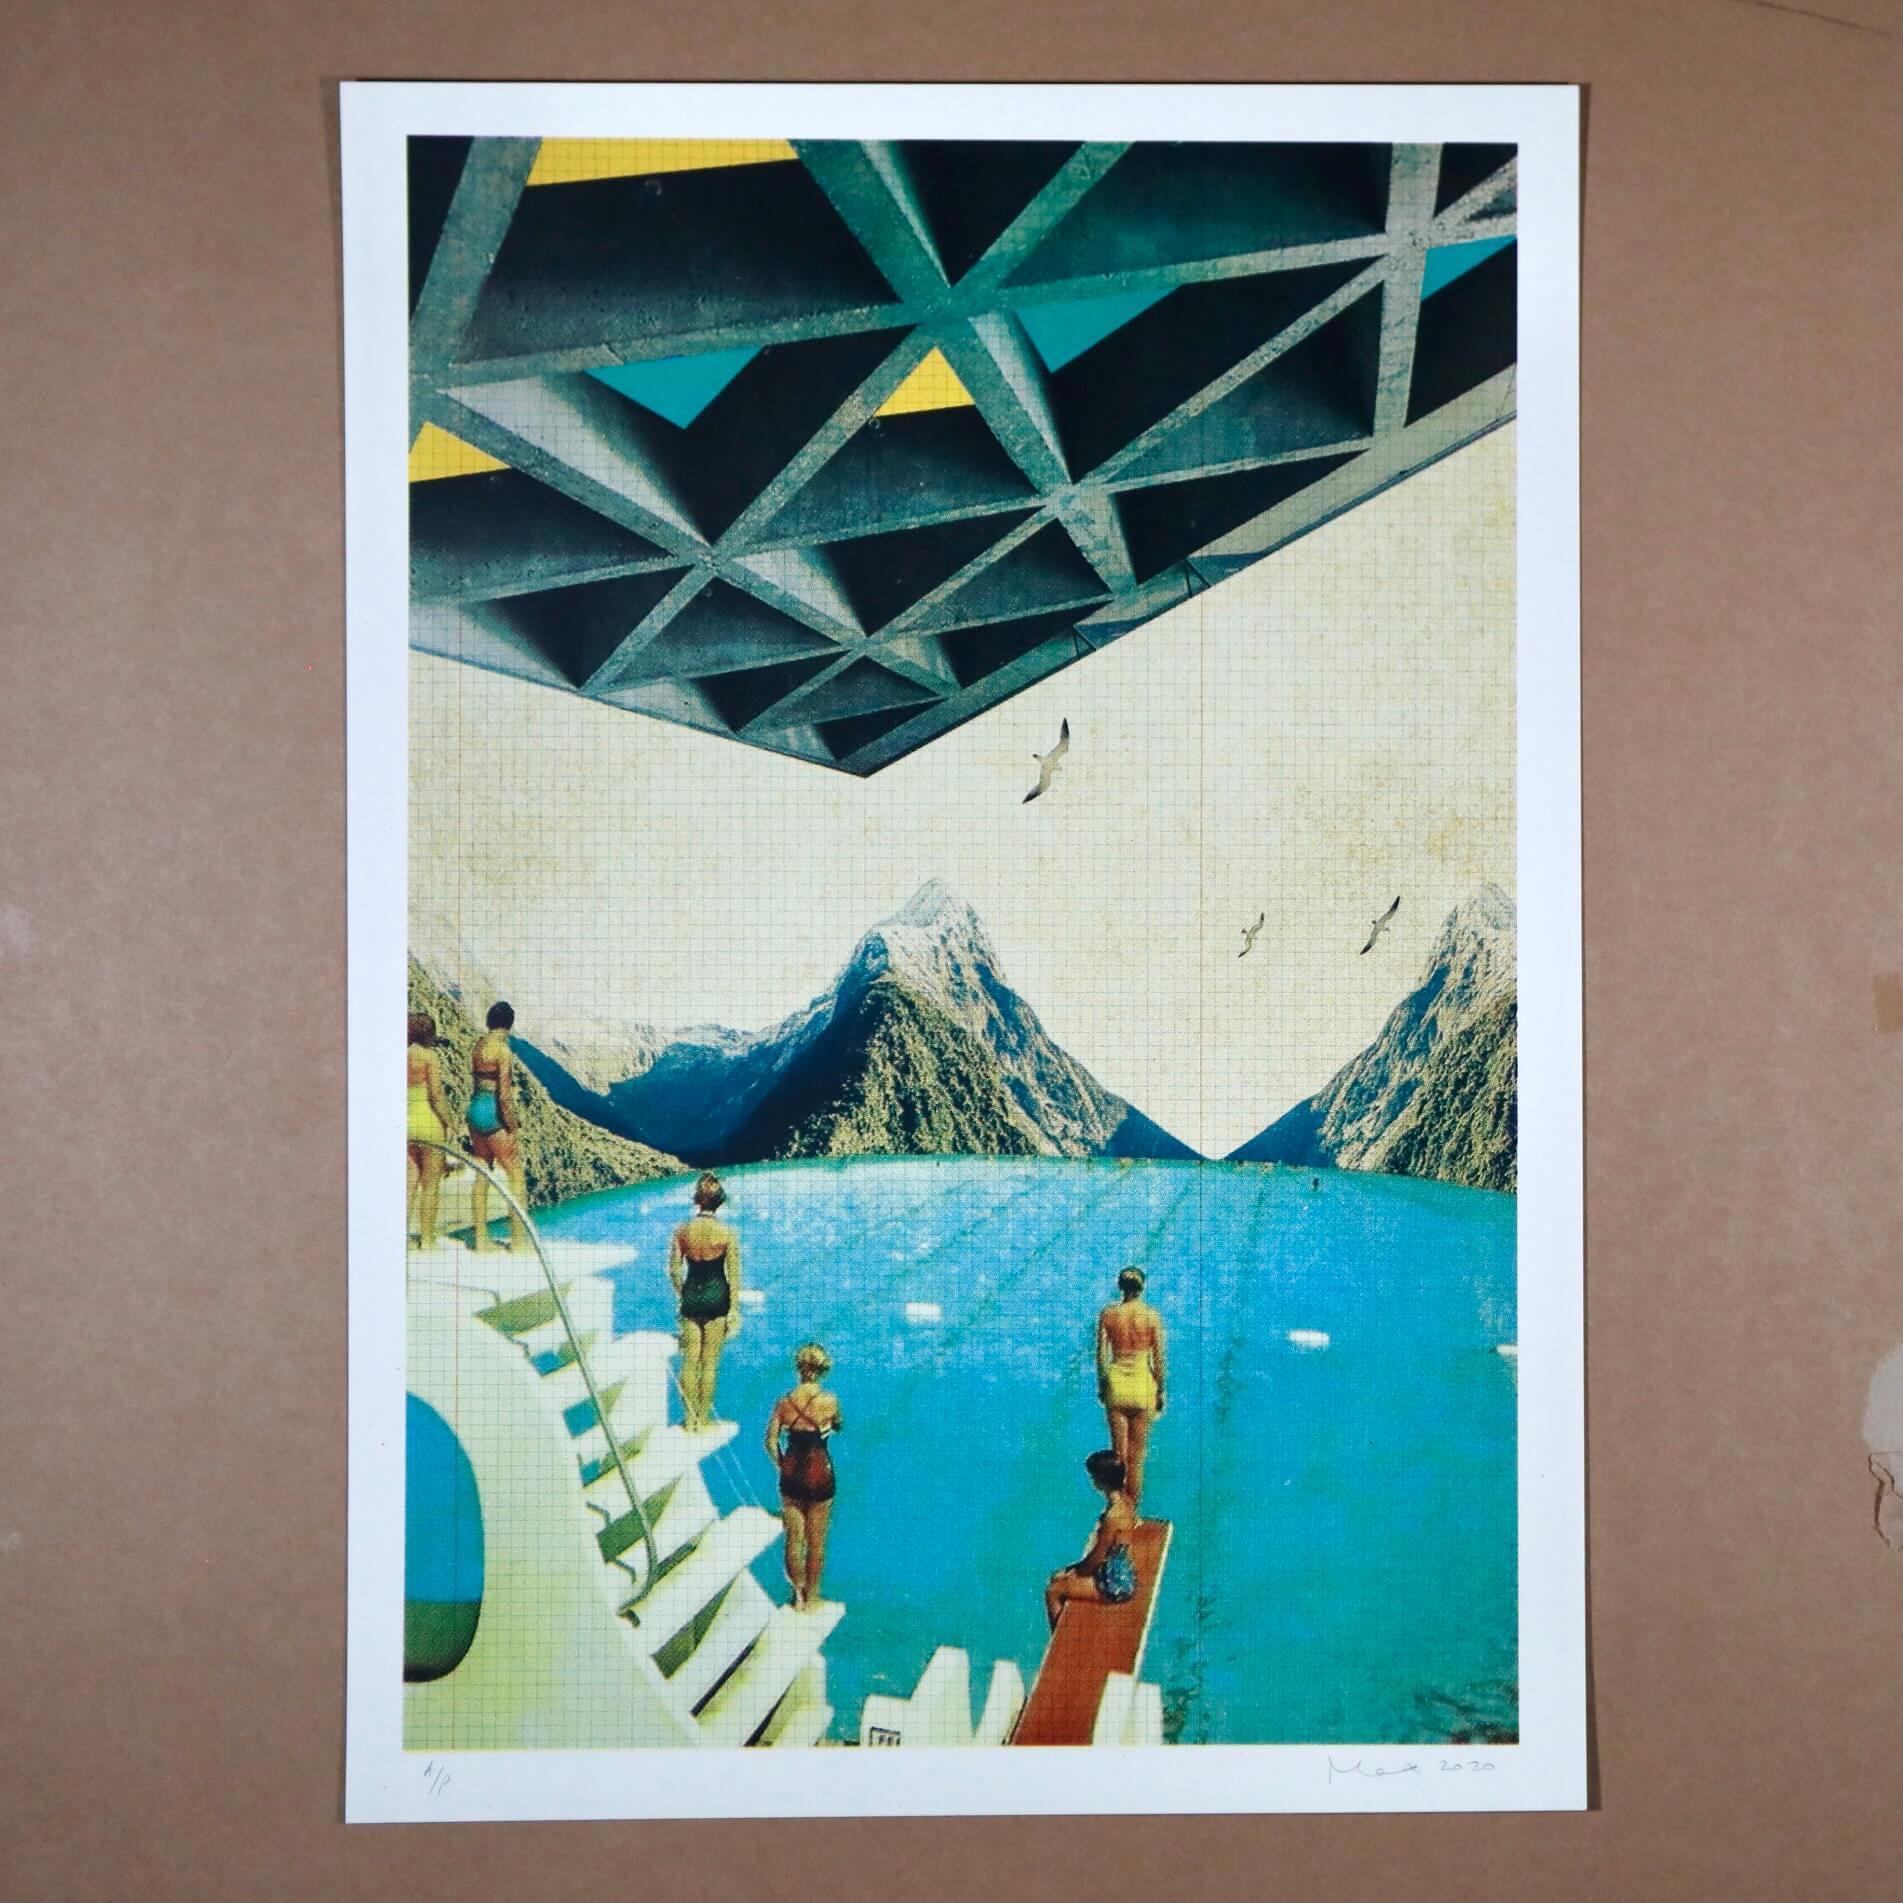 8962FEEB 7504 44D7 9F6D 51D7BE74F60E - Utopian Swim by Maxine Gregson